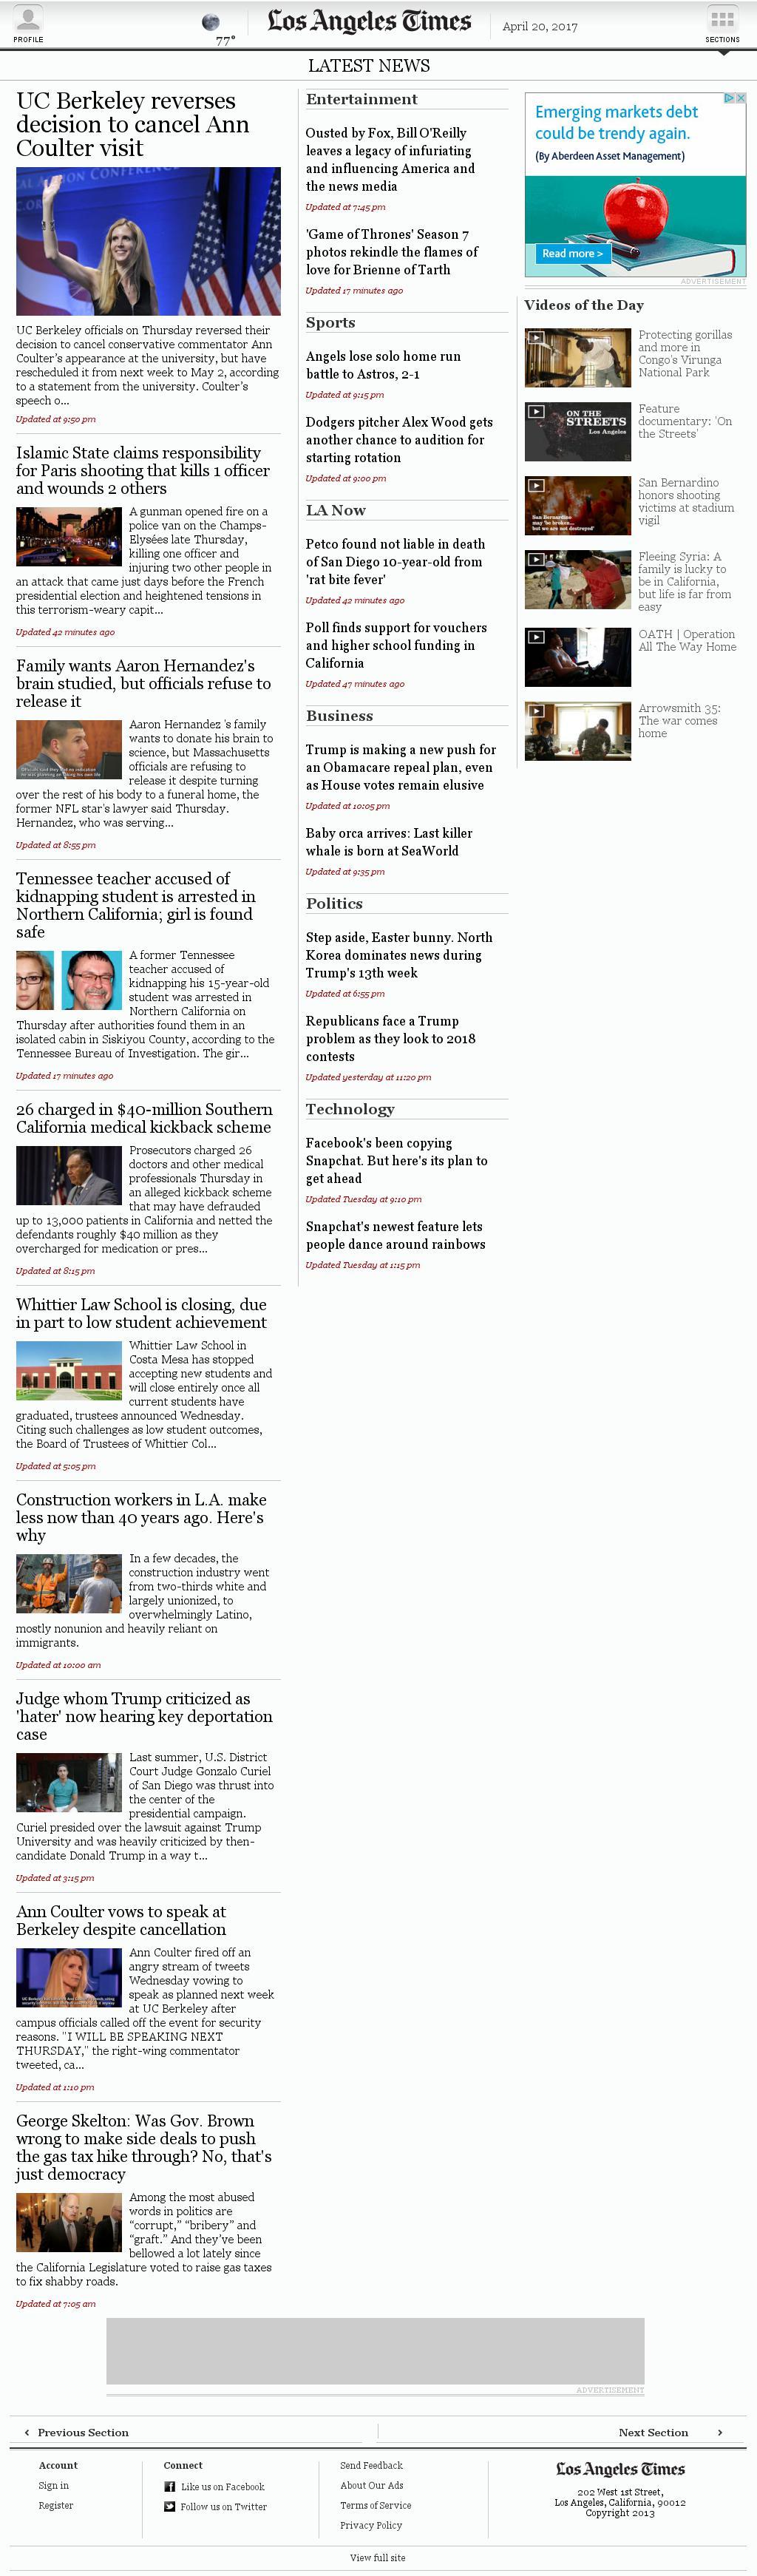 Los Angeles Times at Thursday April 20, 2017, 11:12 p.m. UTC